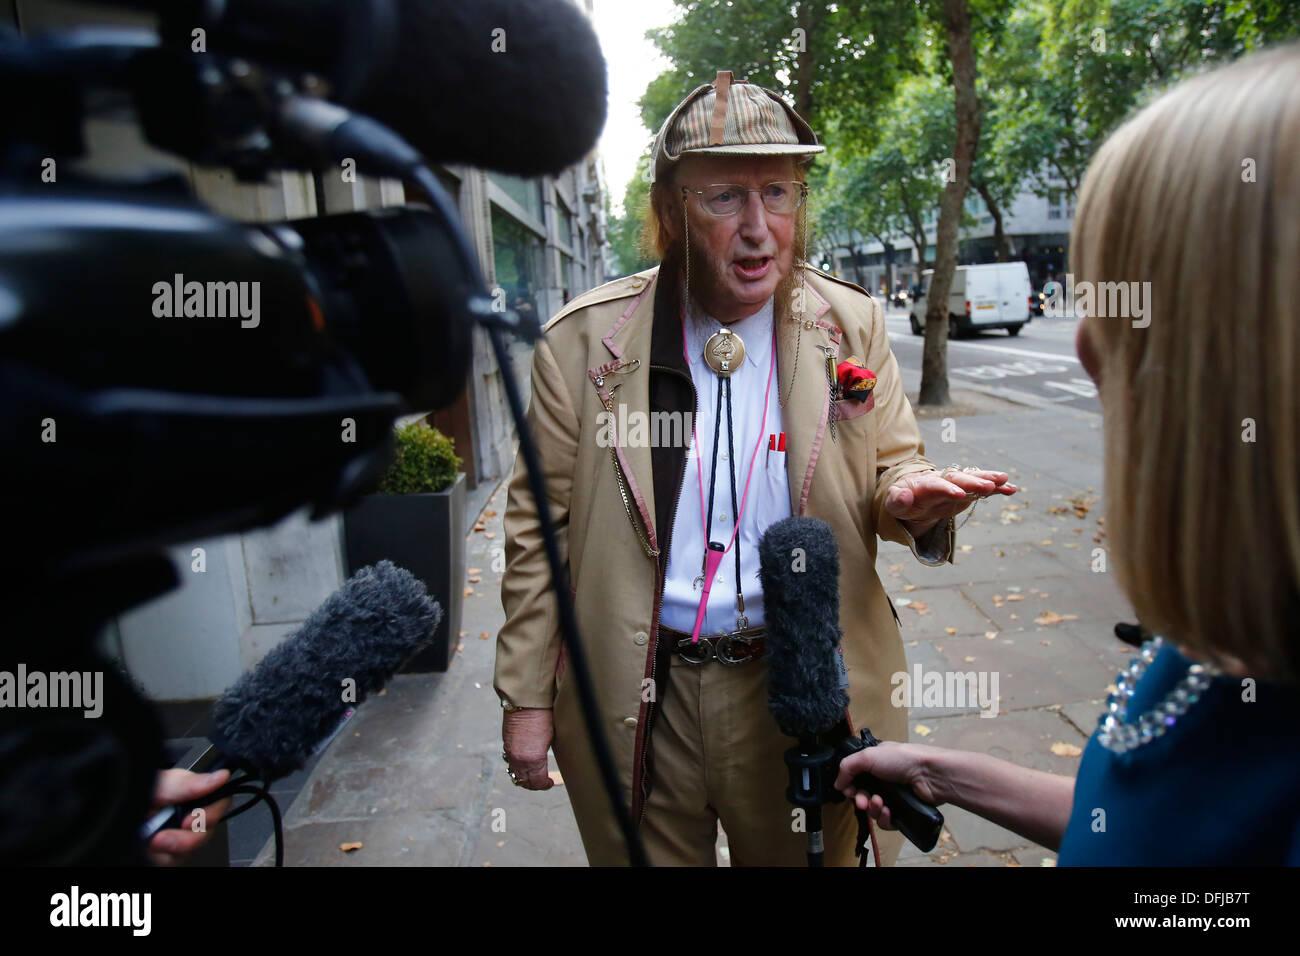 John McCririck arrives at employment tribunal vs Channel 4 & others for unfair dismissal in London Britain 30 September 2013. - Stock Image